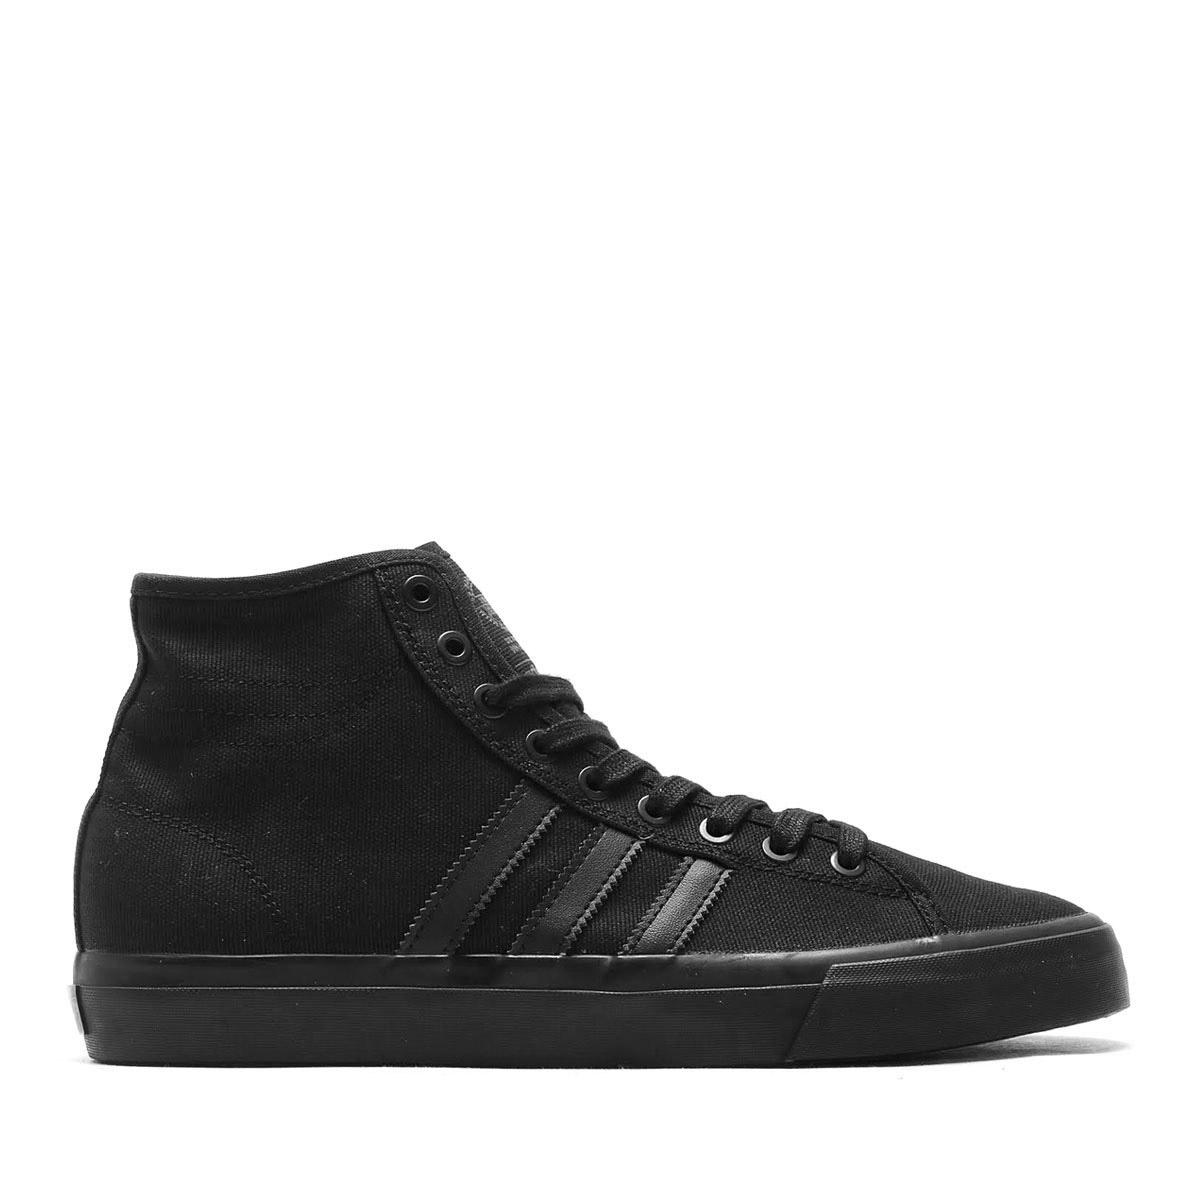 adidas Originals Skateboarding MATCHCOURT HIGH RX (아디다스오리지나르스스케이트보딘그맛치코트하이 RX) (Core Black/Core Black/Core Black) 17 SS-I